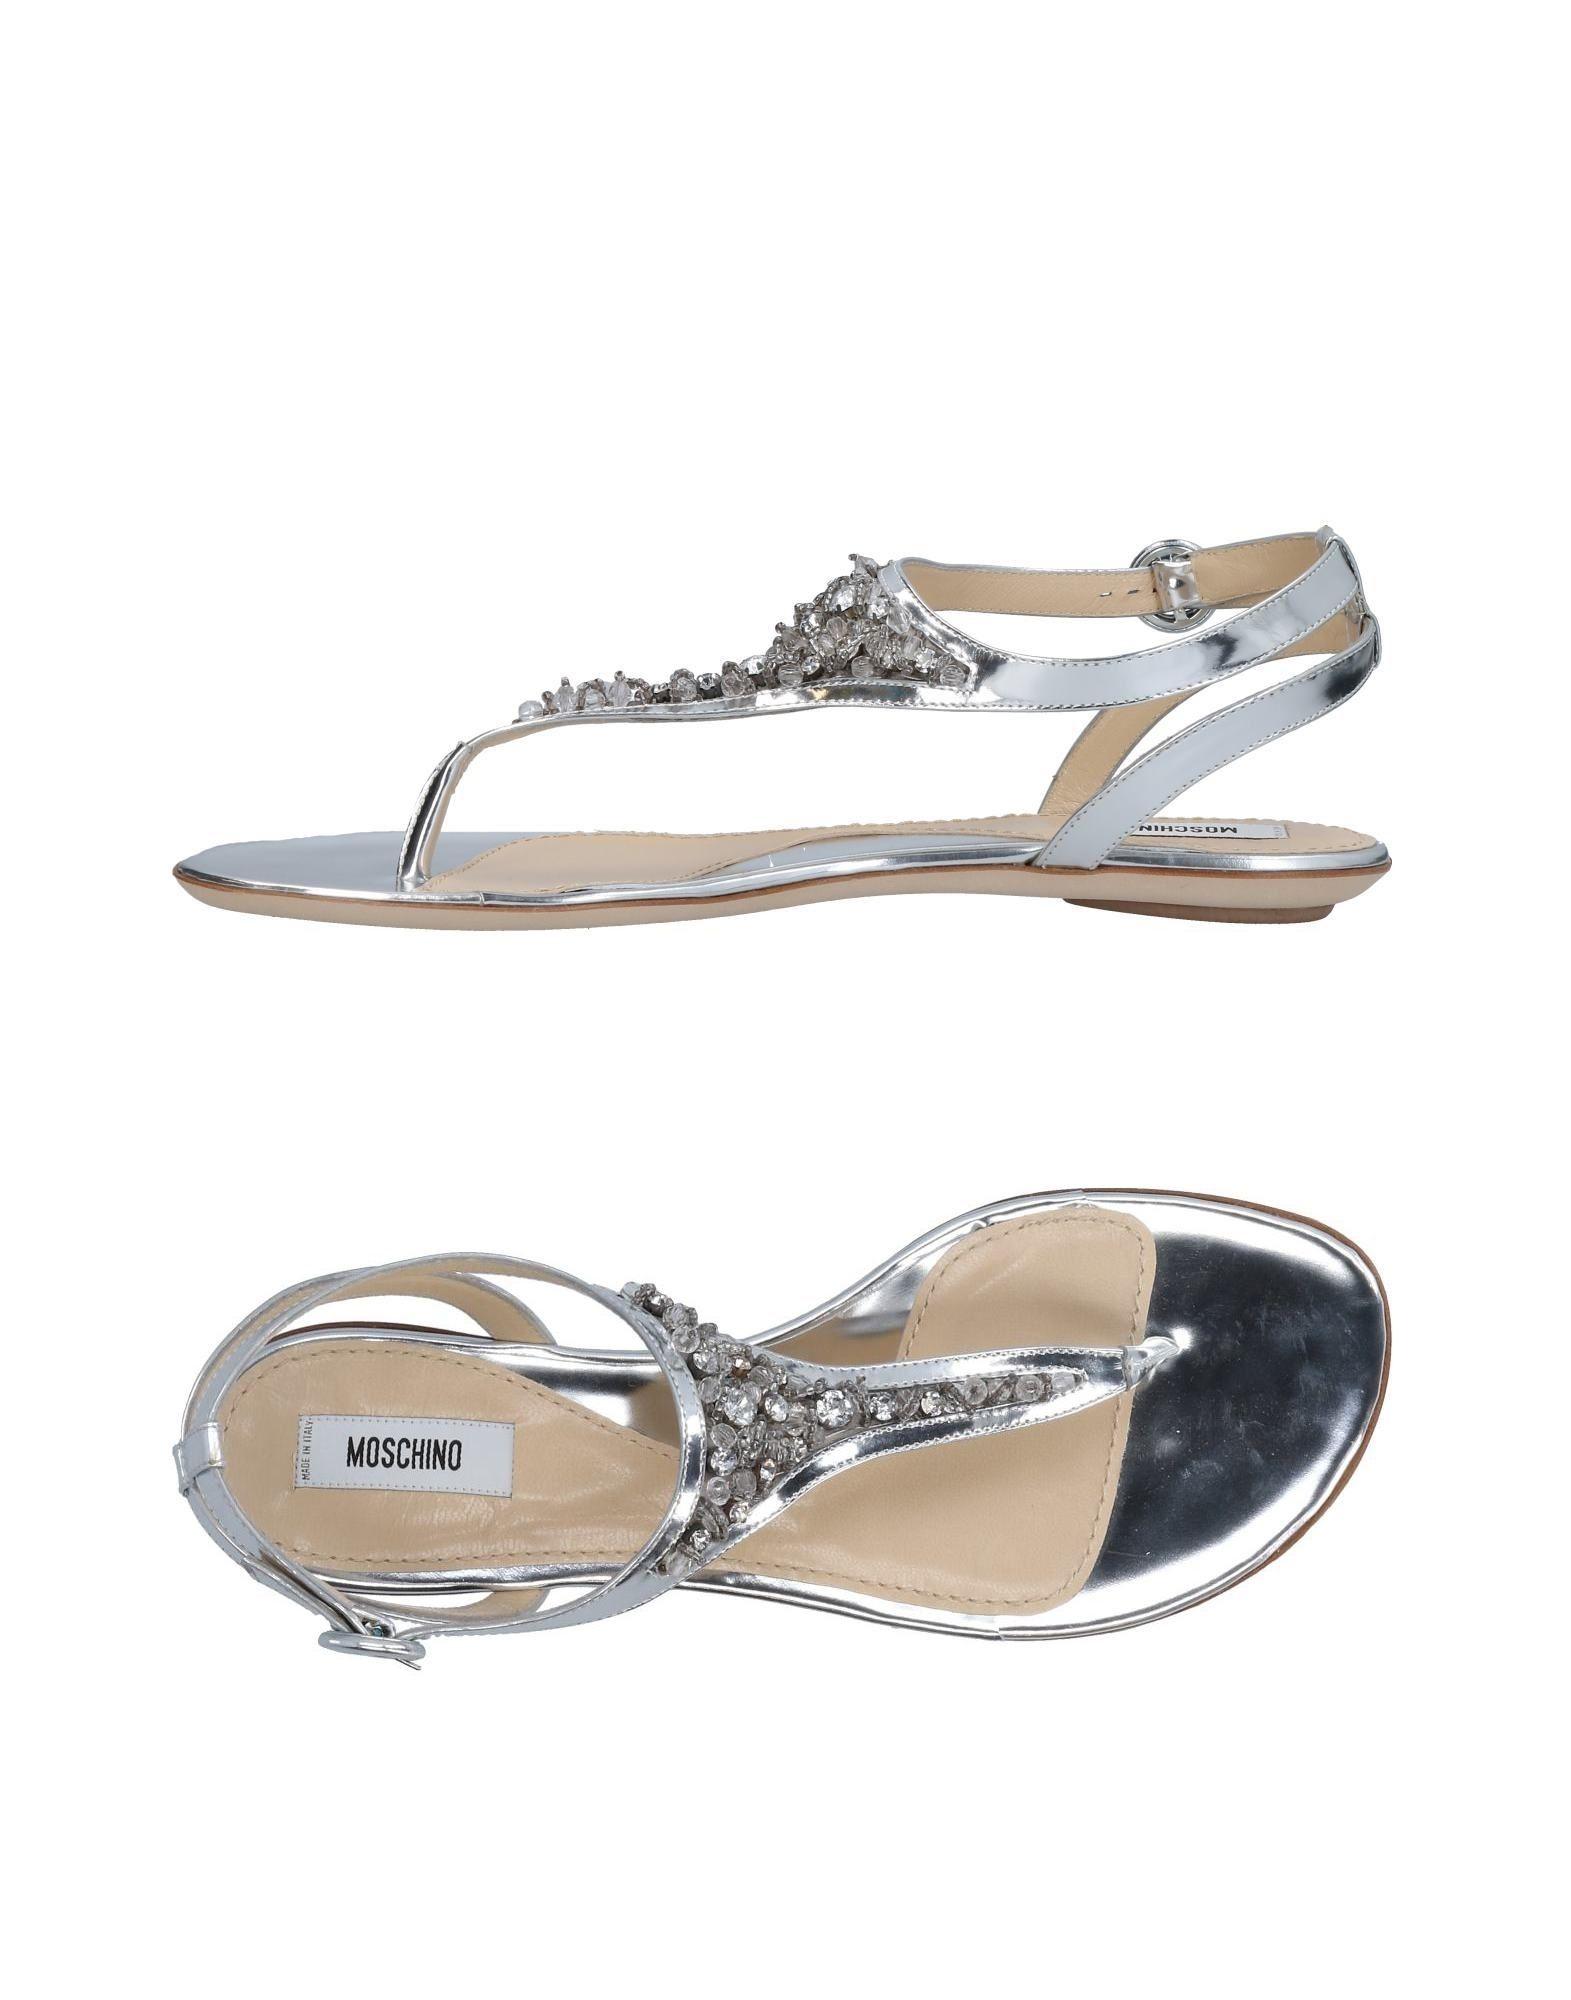 Moschino on Flip Flops - Women Moschino Flip Flops online on Moschino  Australia - 11462355AQ f6e08d